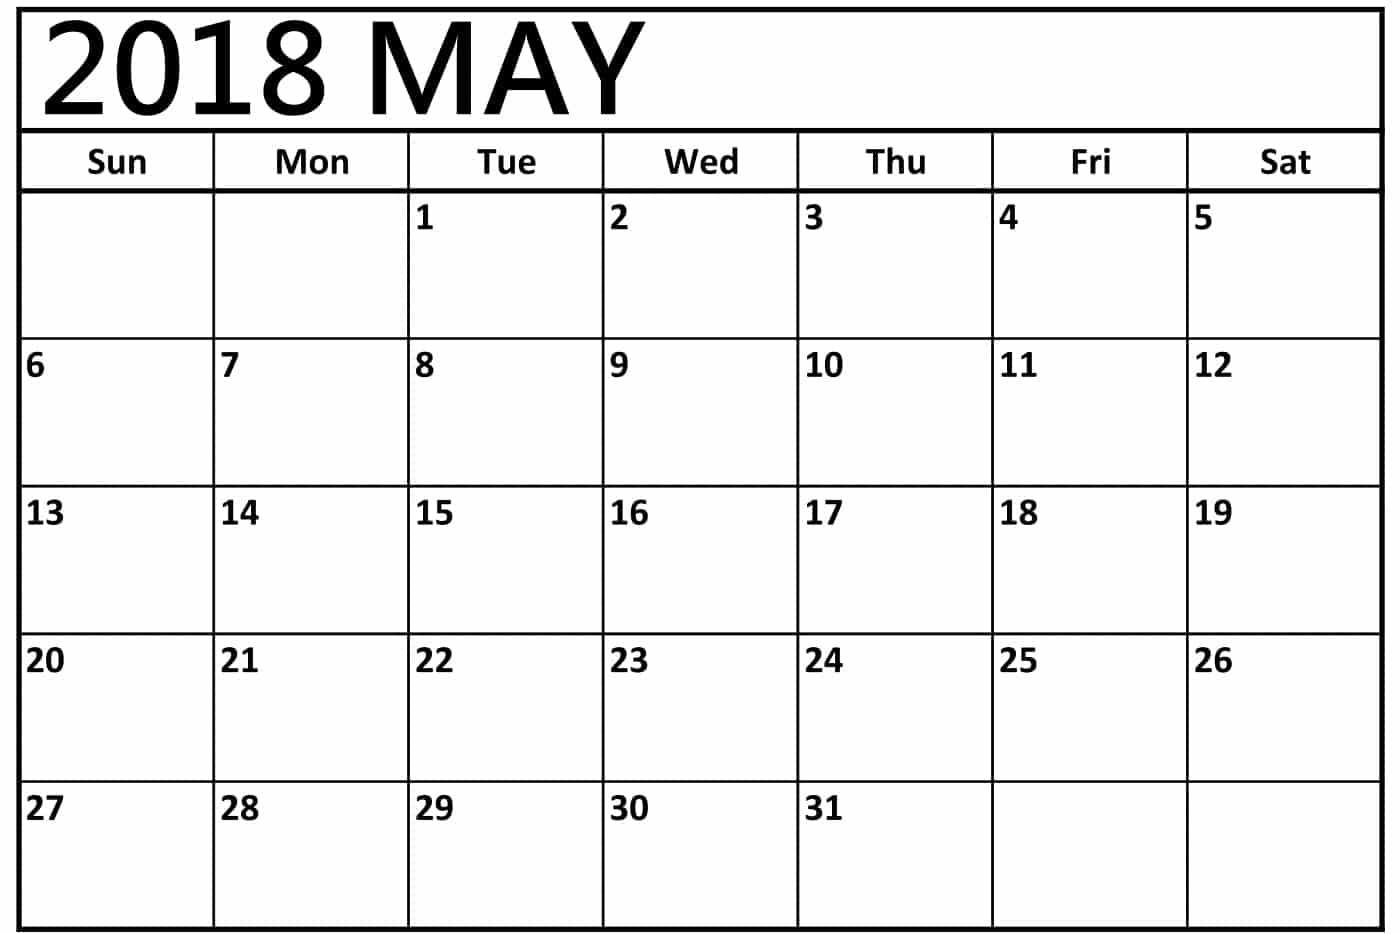 May 2018 Calendar Printable